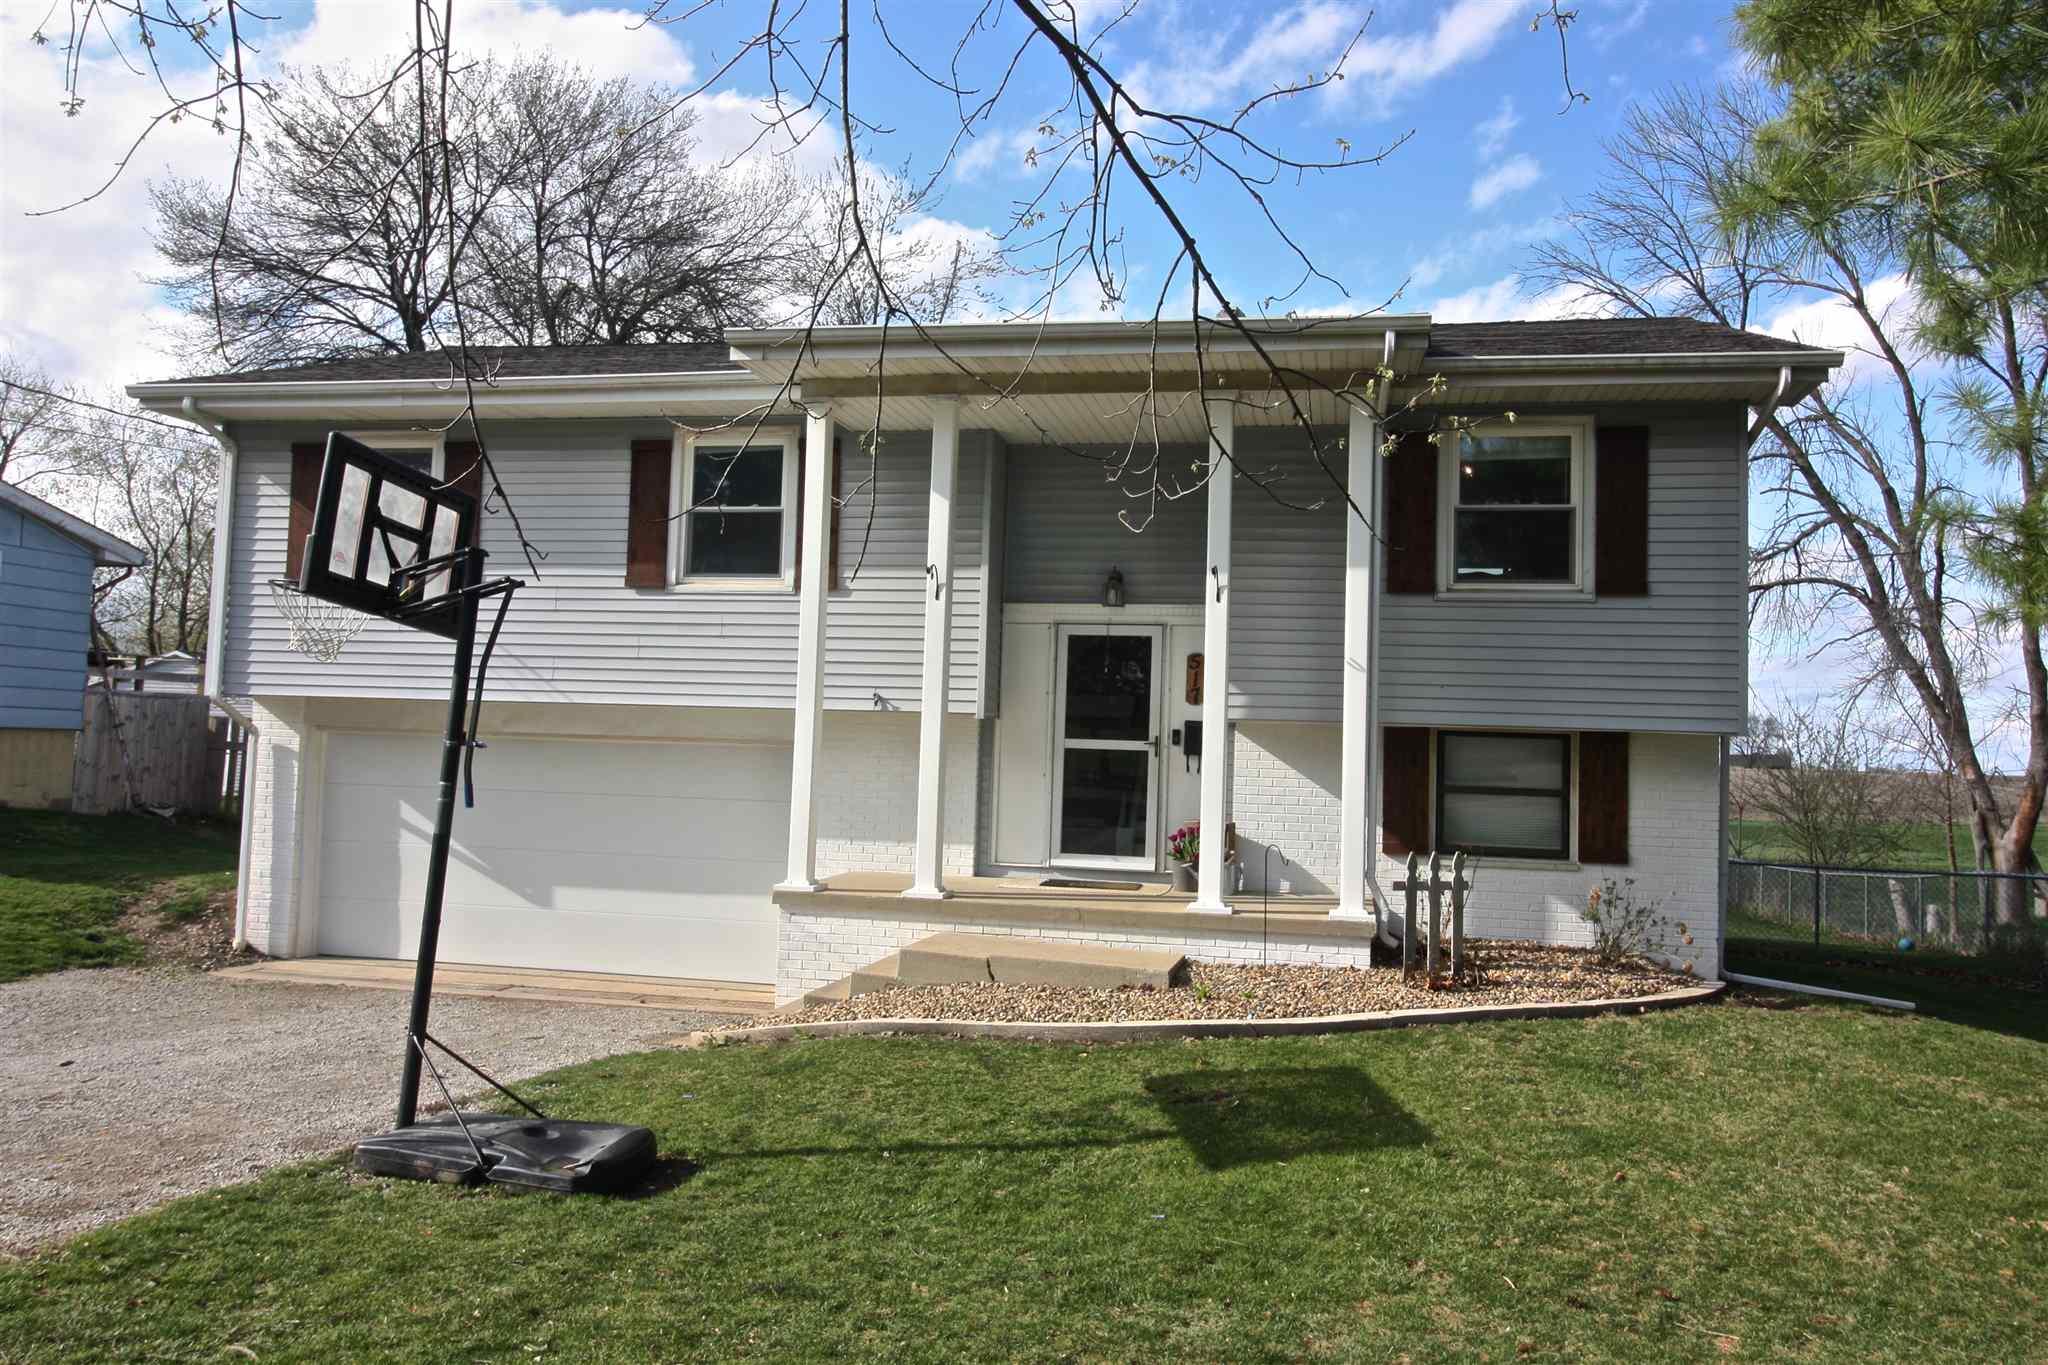 517 E JAMES Property Photo - Eureka, IL real estate listing